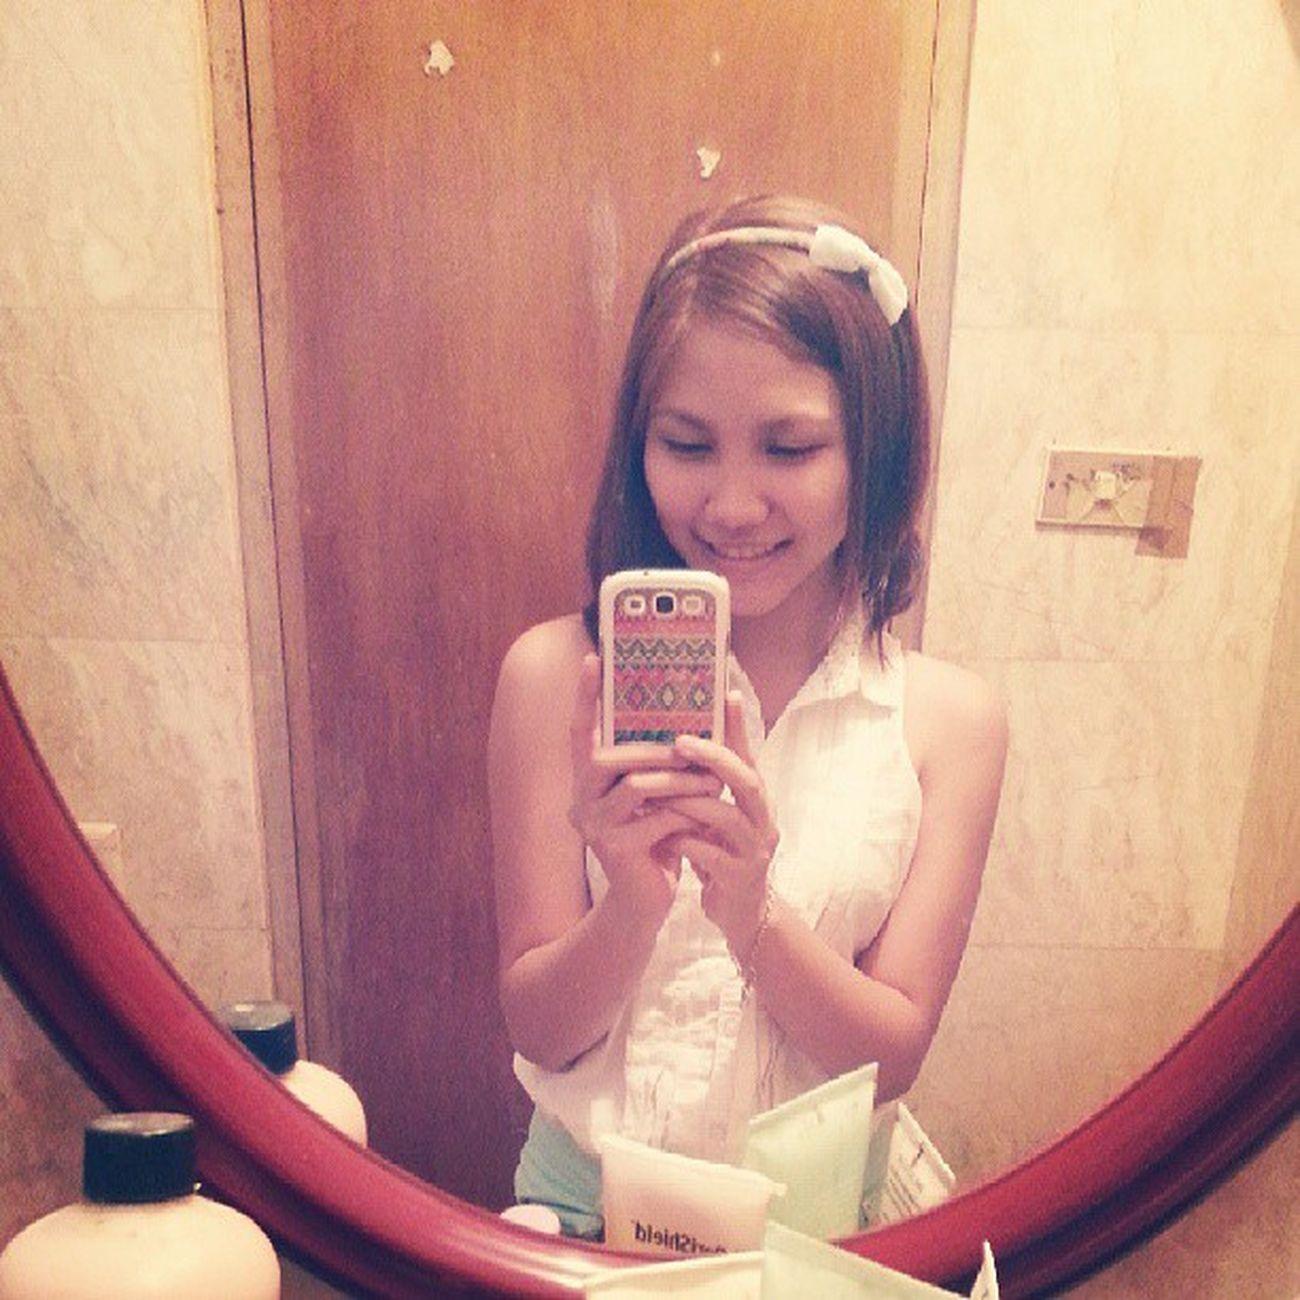 Hellowaaaaa ;) Instavain Vain Vanity Selfie selca @justincase_ph